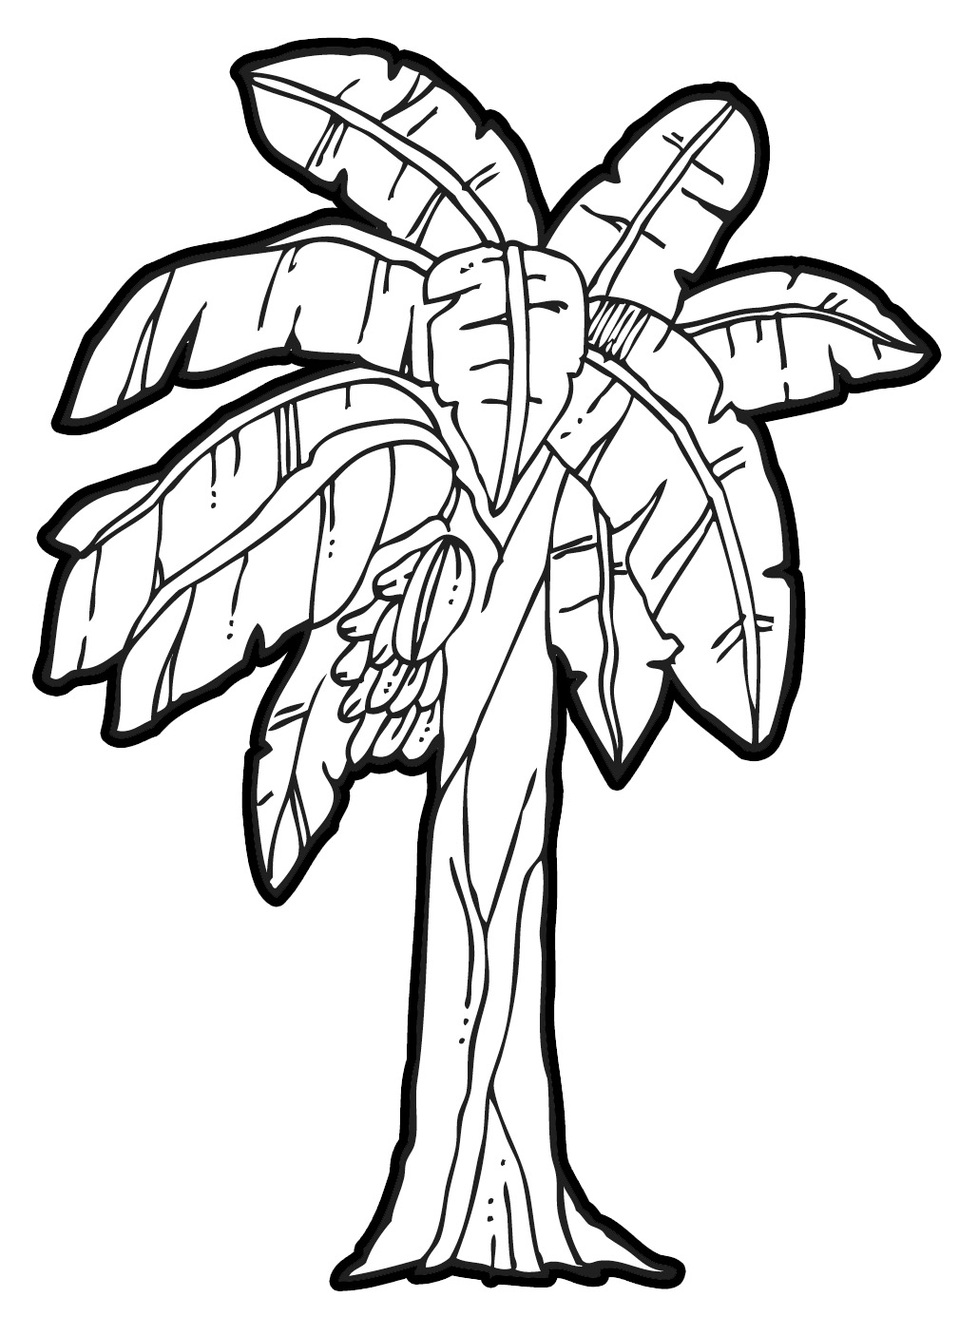 Banana tree leaf outline clipart.